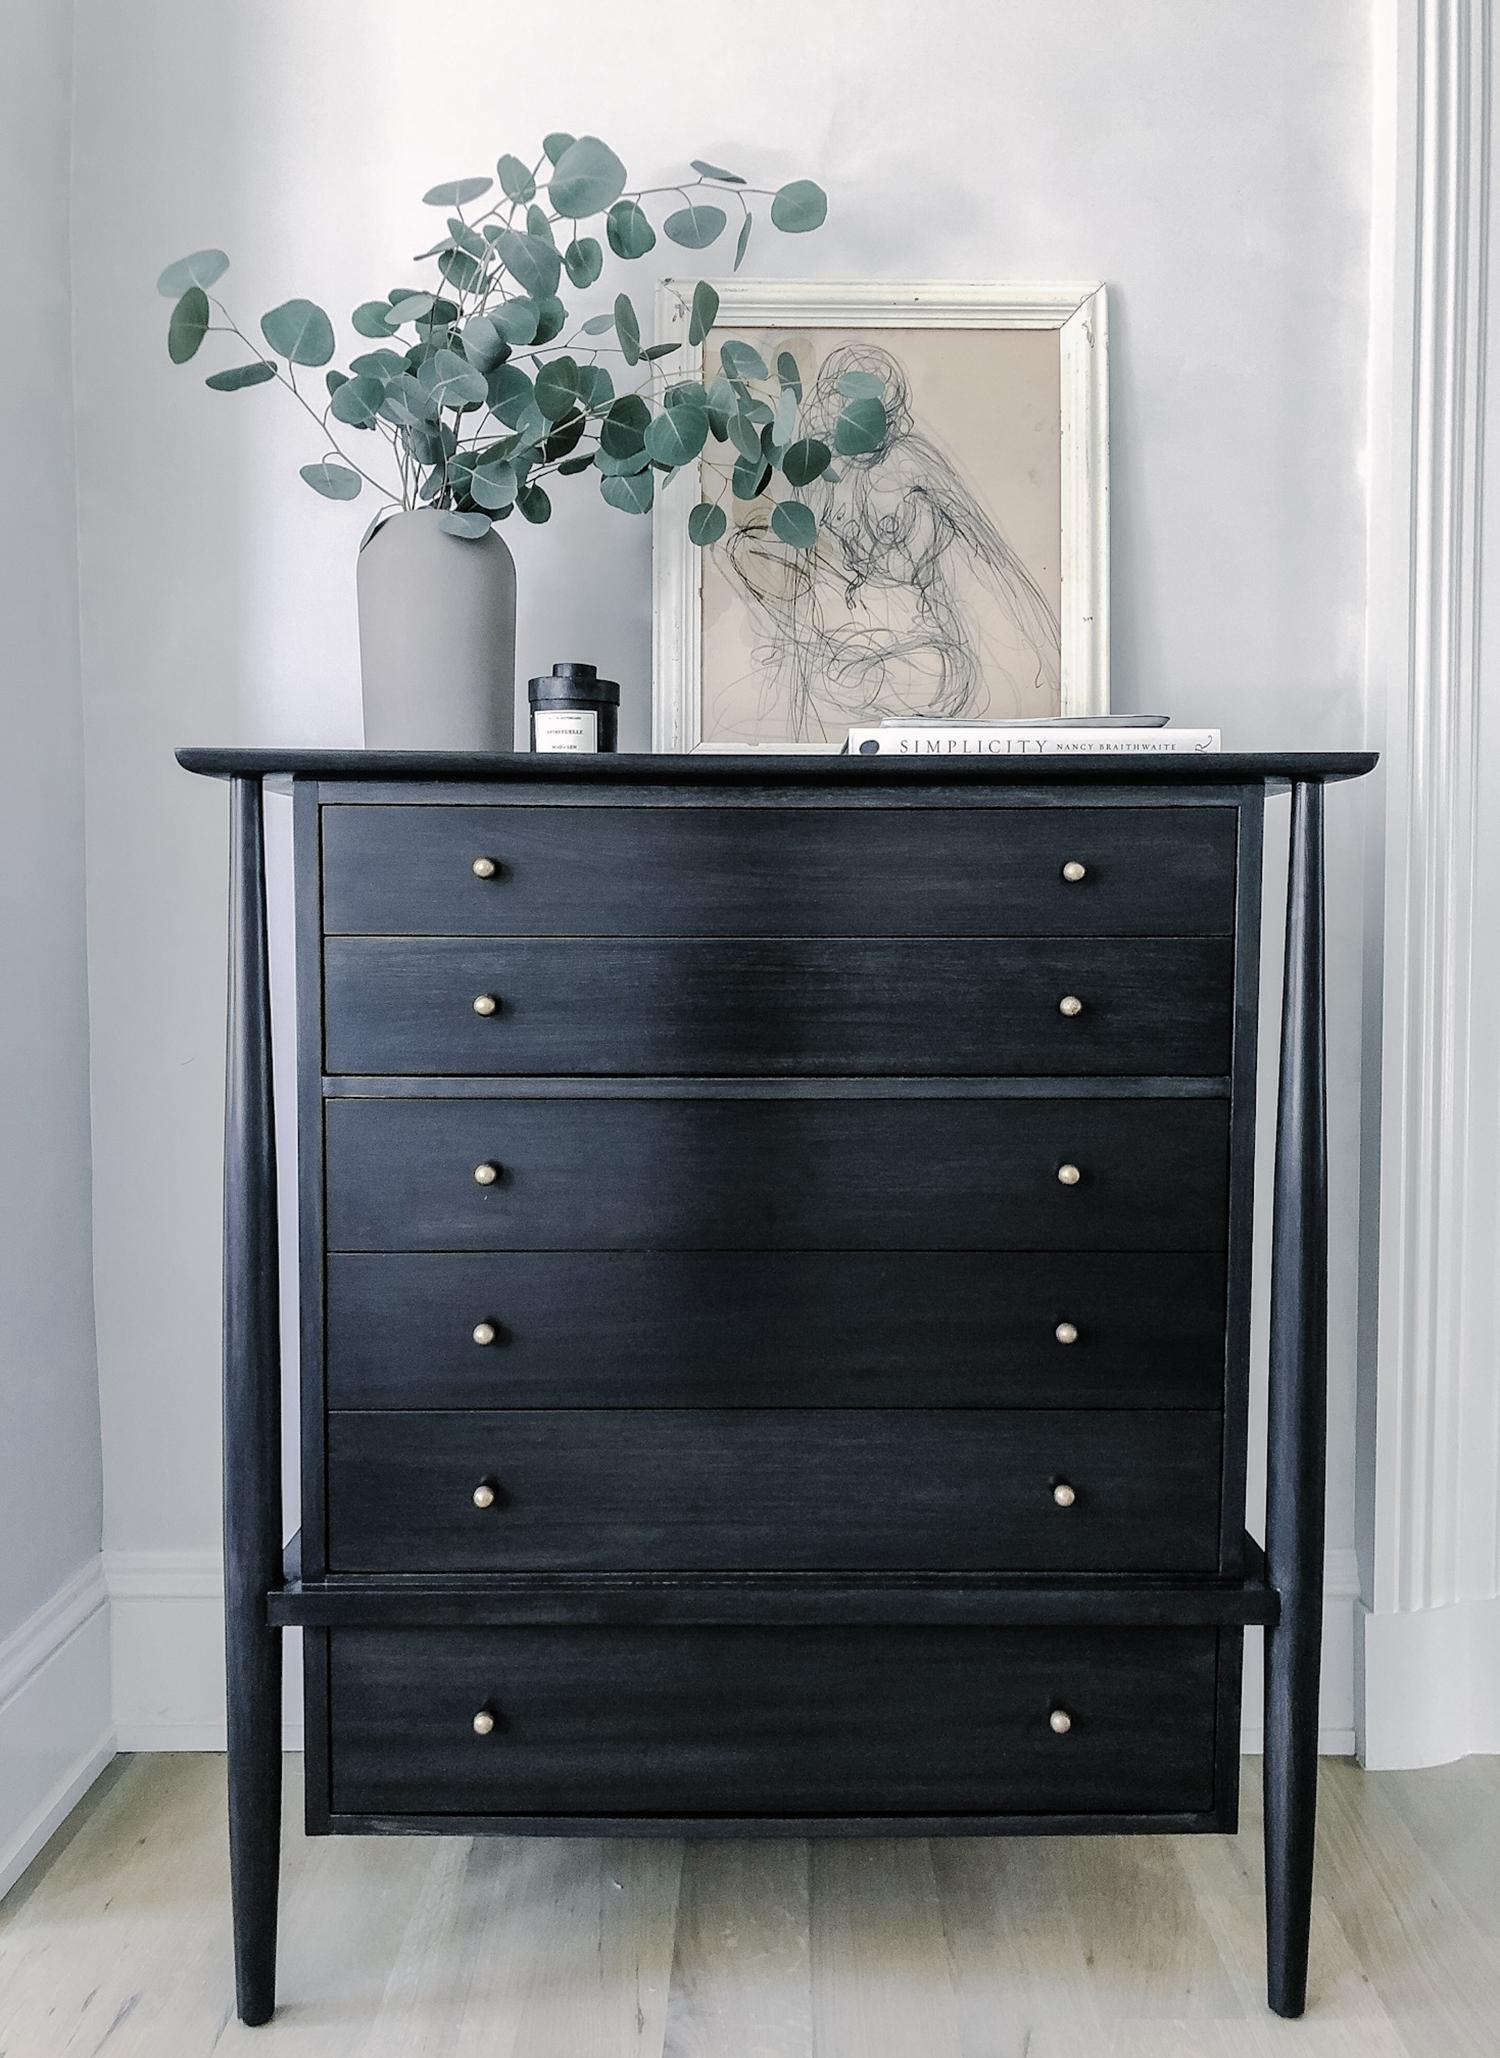 Vintage dresser refinished in custom ebony wood stain   Revitaliste San Francisco & Los Angeles